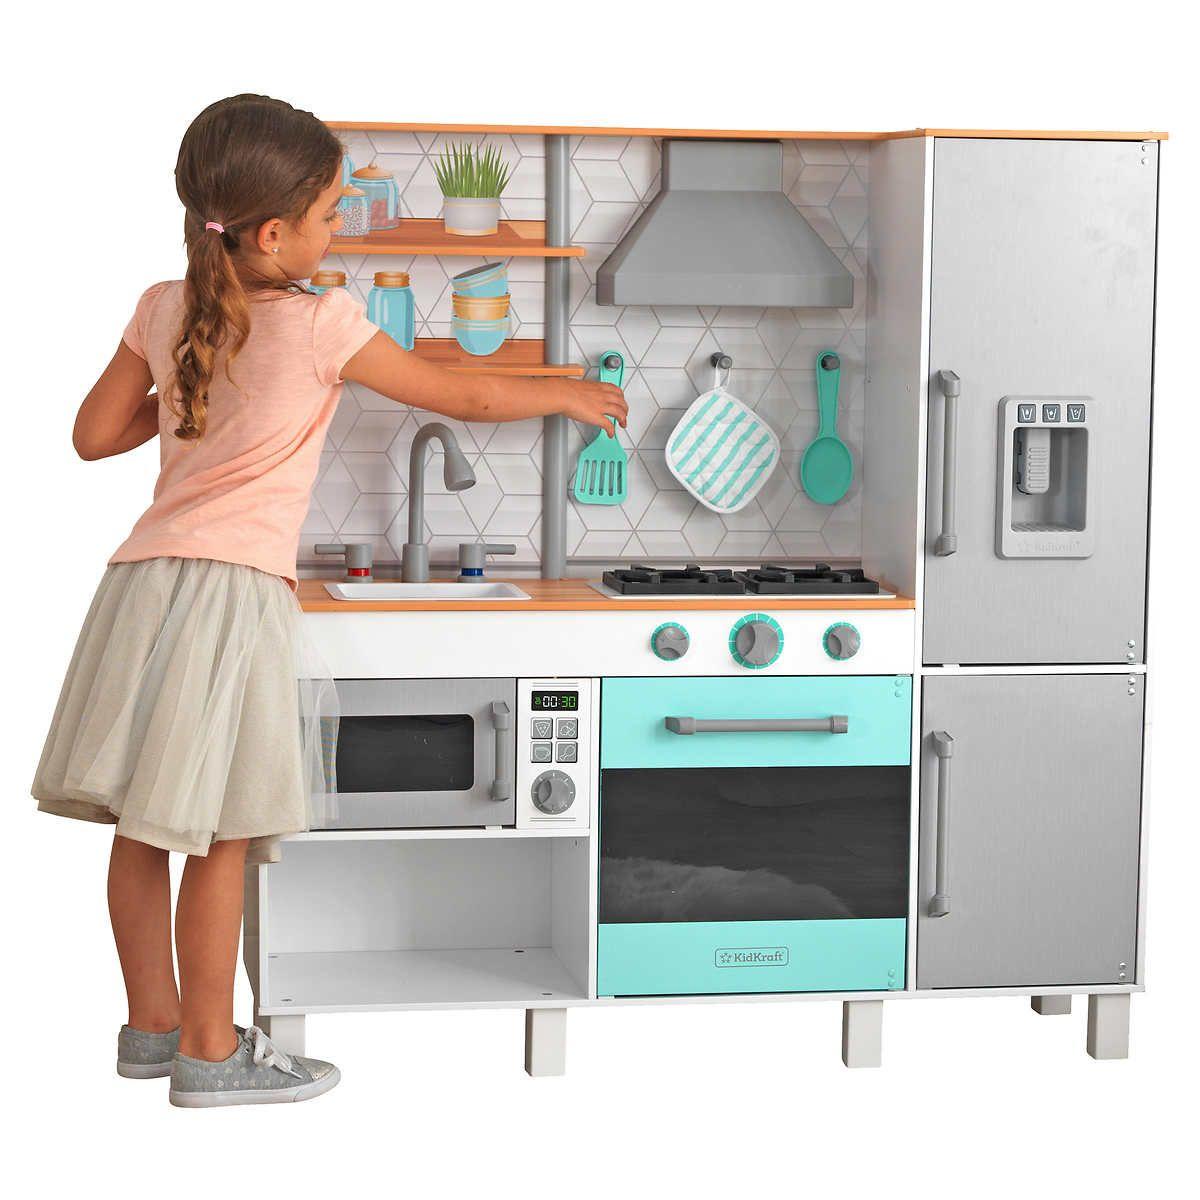 Costco gourmet kitchen play set play kitchen gourmet